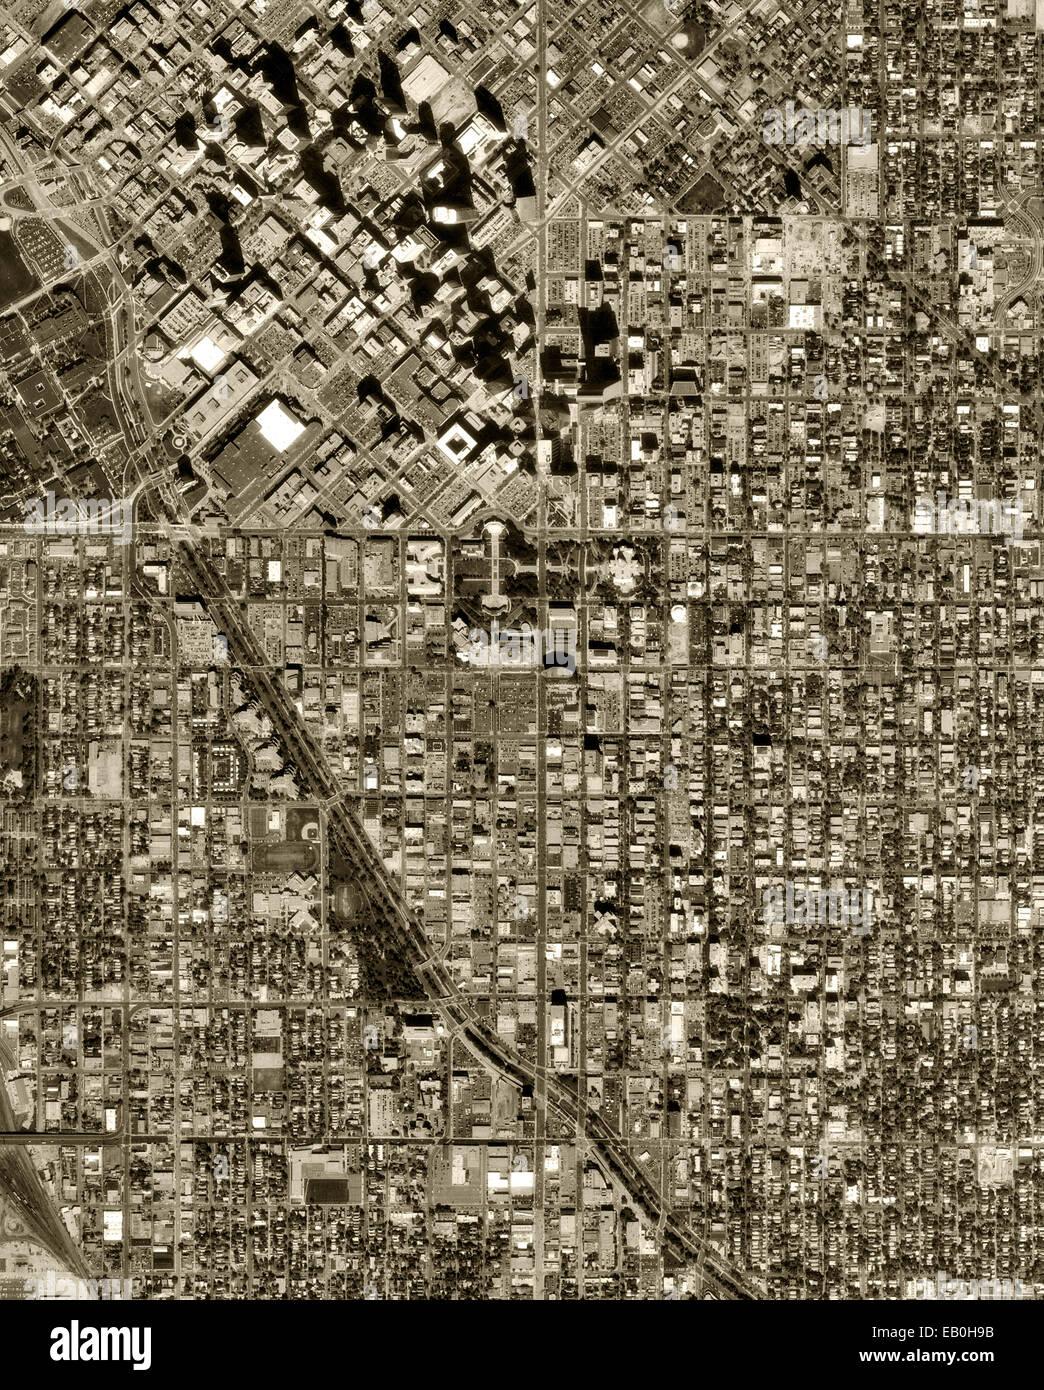 historical aerial photograph Denver, Colorado, 1999 - Stock Image